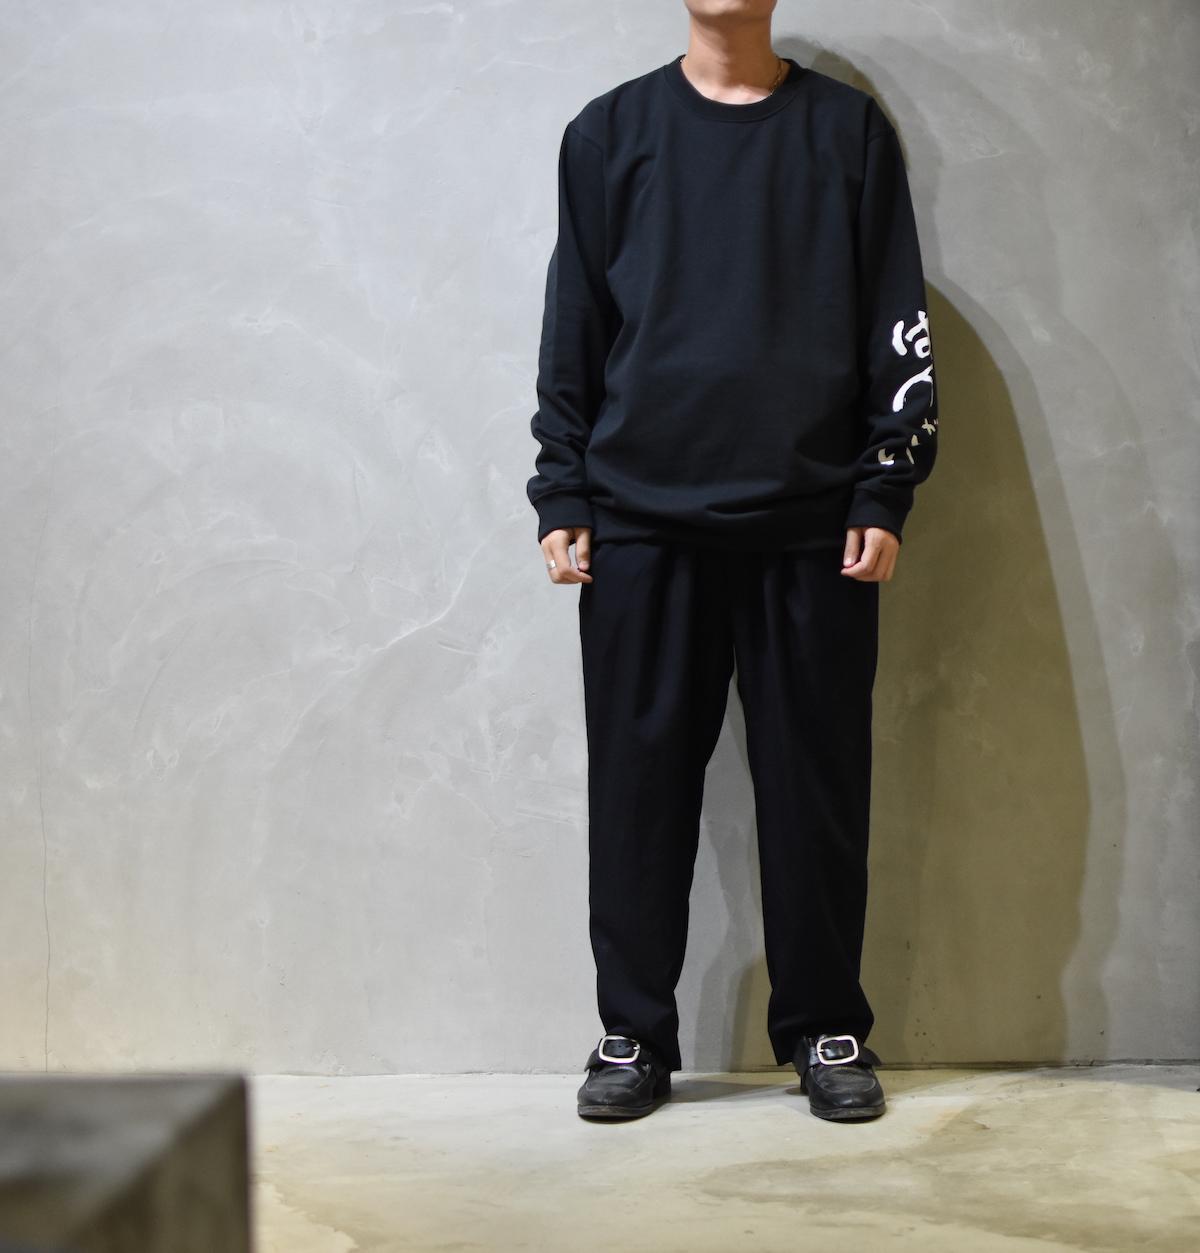 AUGUSTE-PRESENTATION × 荒川玄二郎 「 ばんざい リメイクスウェット / BLACK 」